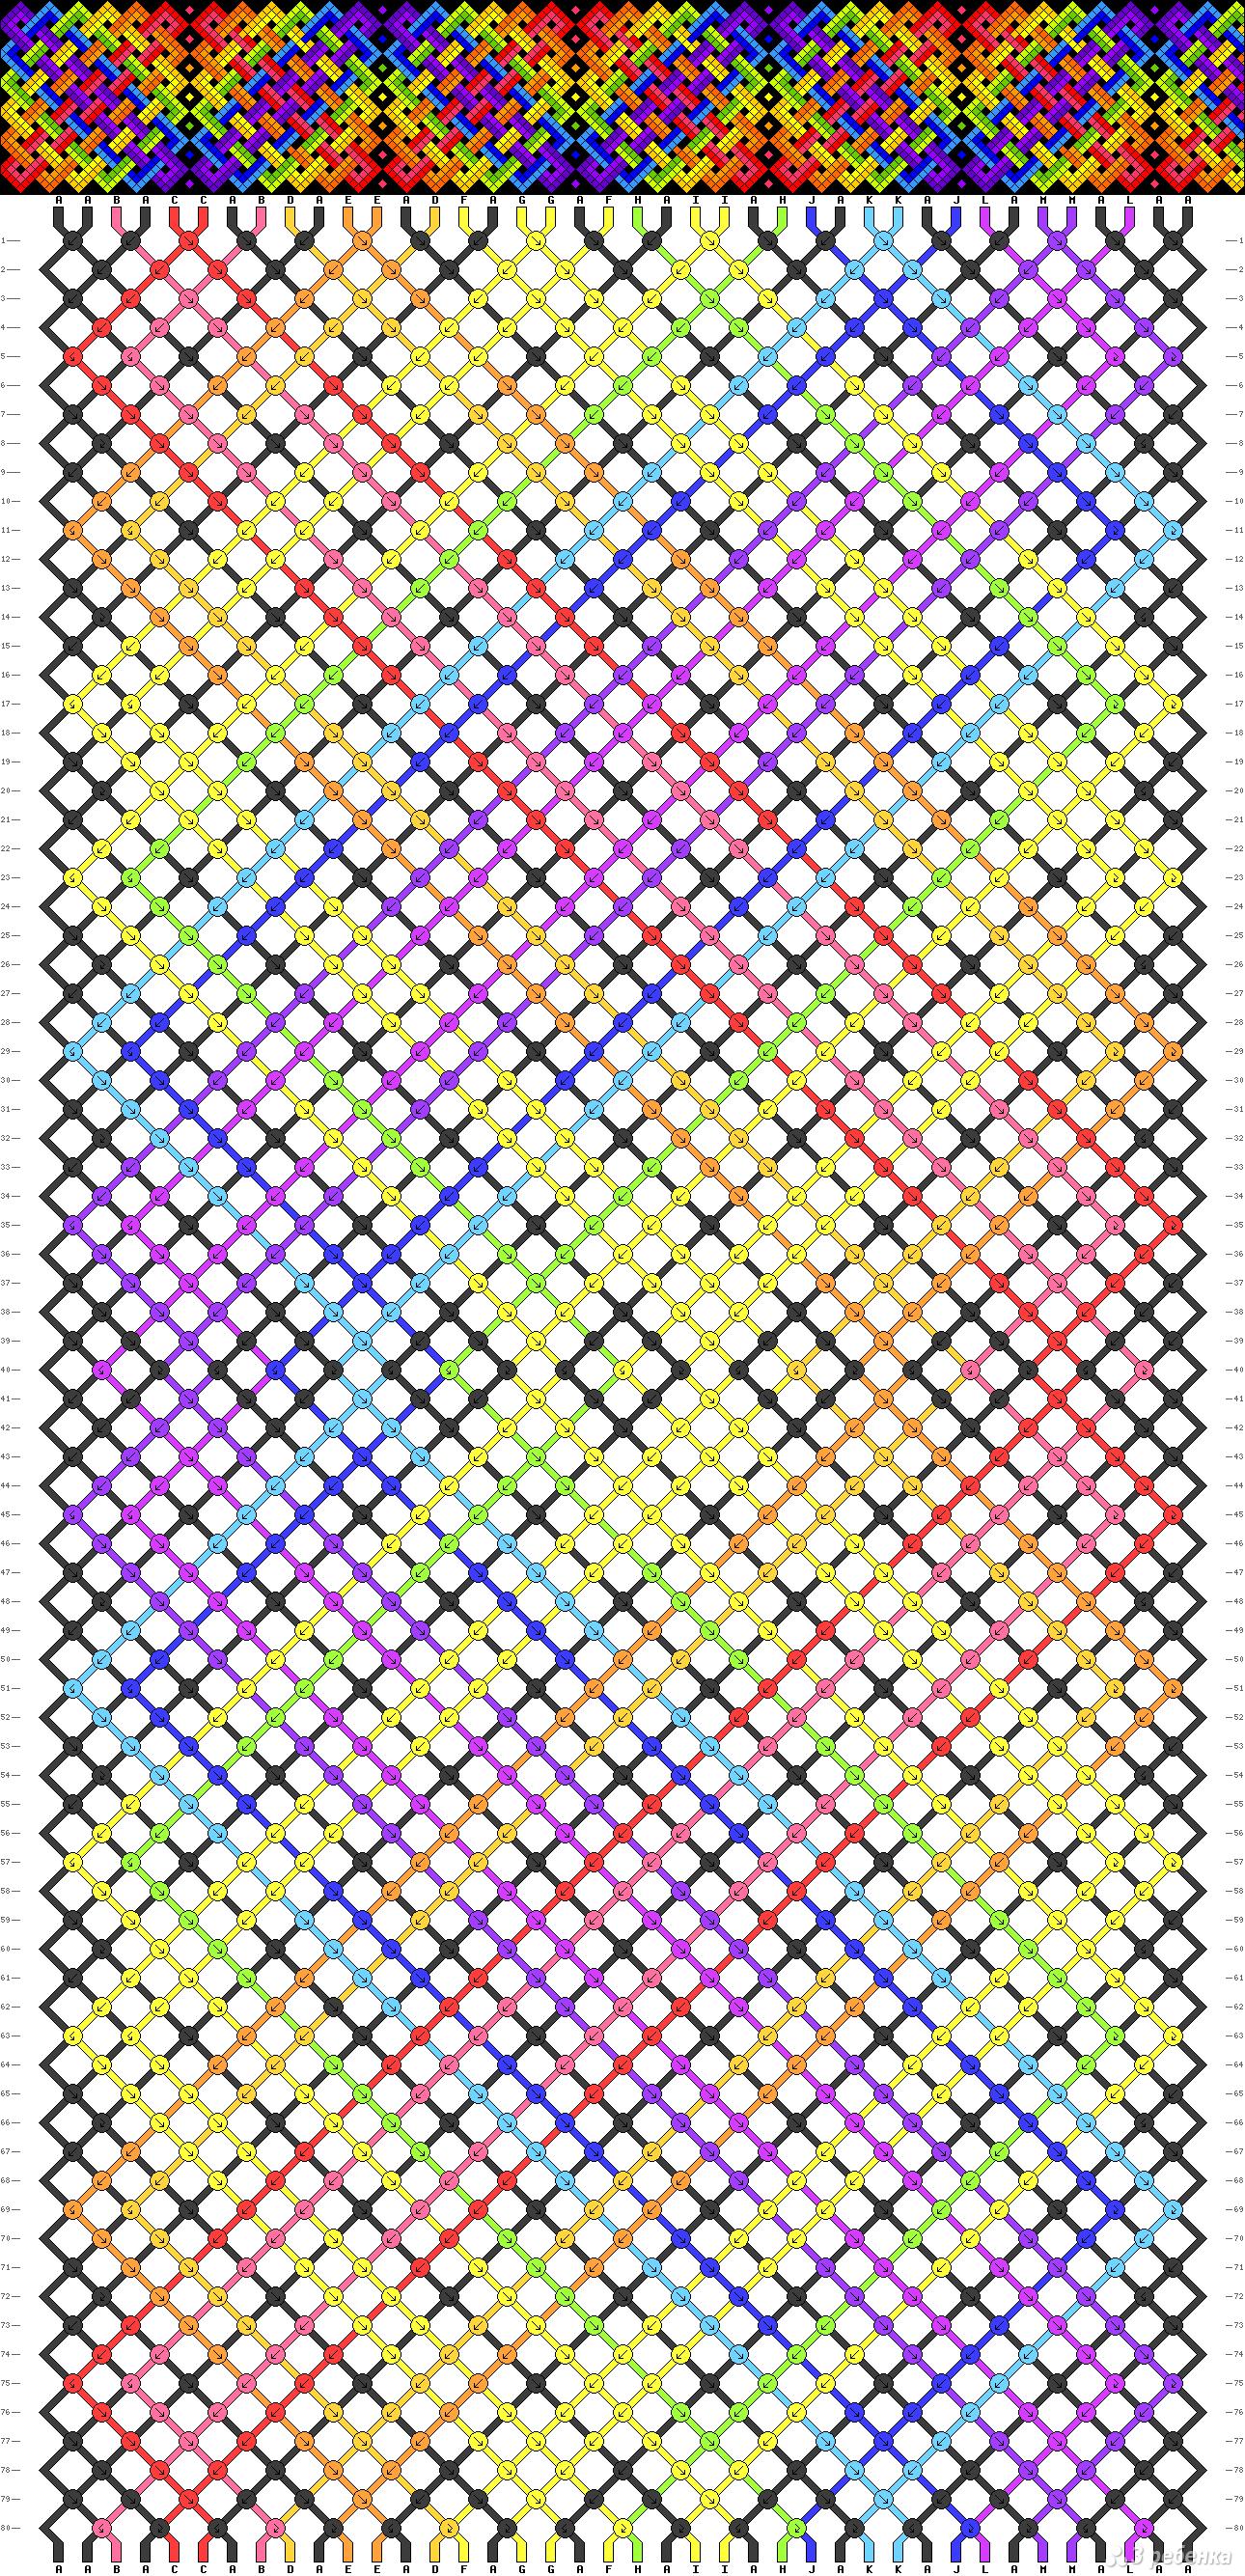 Подробная схема фенечки